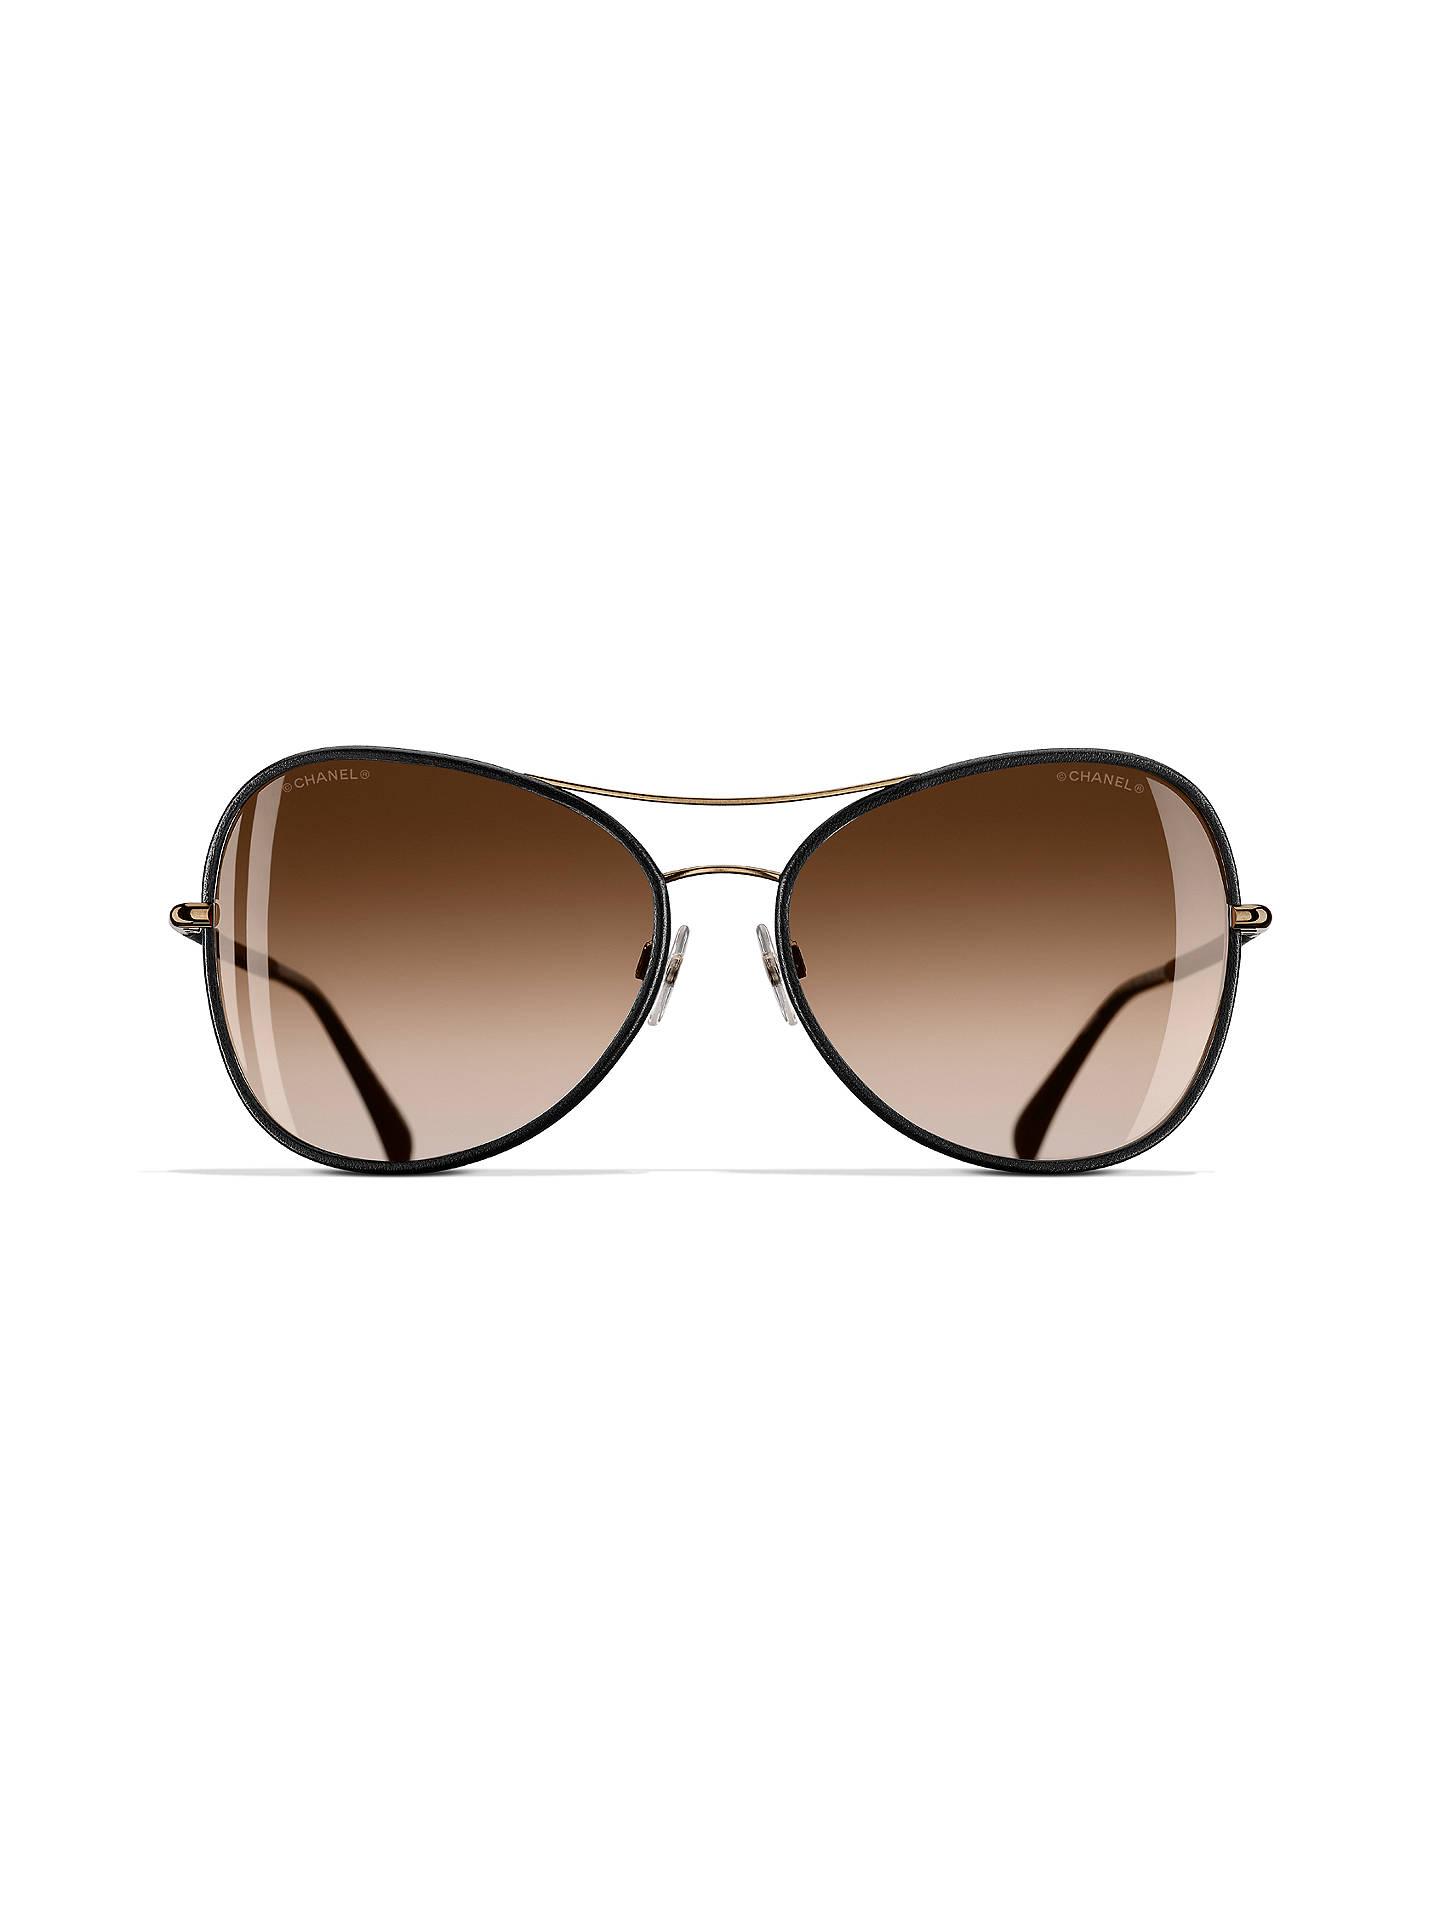 6b113a2c76 ... BuyCHANEL Pilot Sunglasses CH4227Q Black Gold Online at johnlewis.com  ...